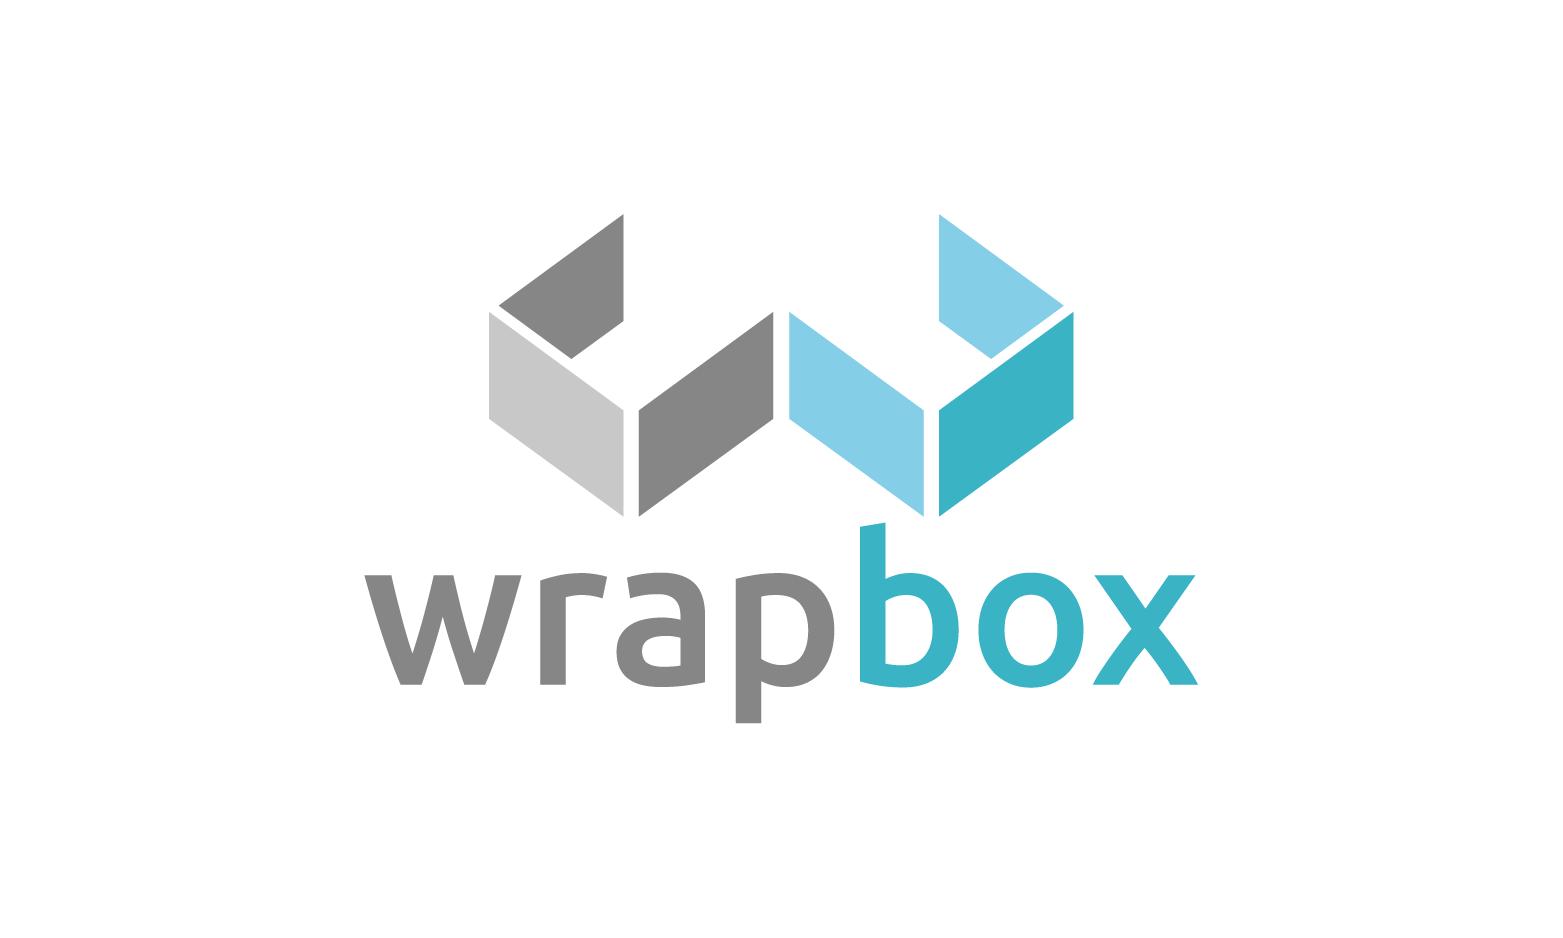 wrapbox.co